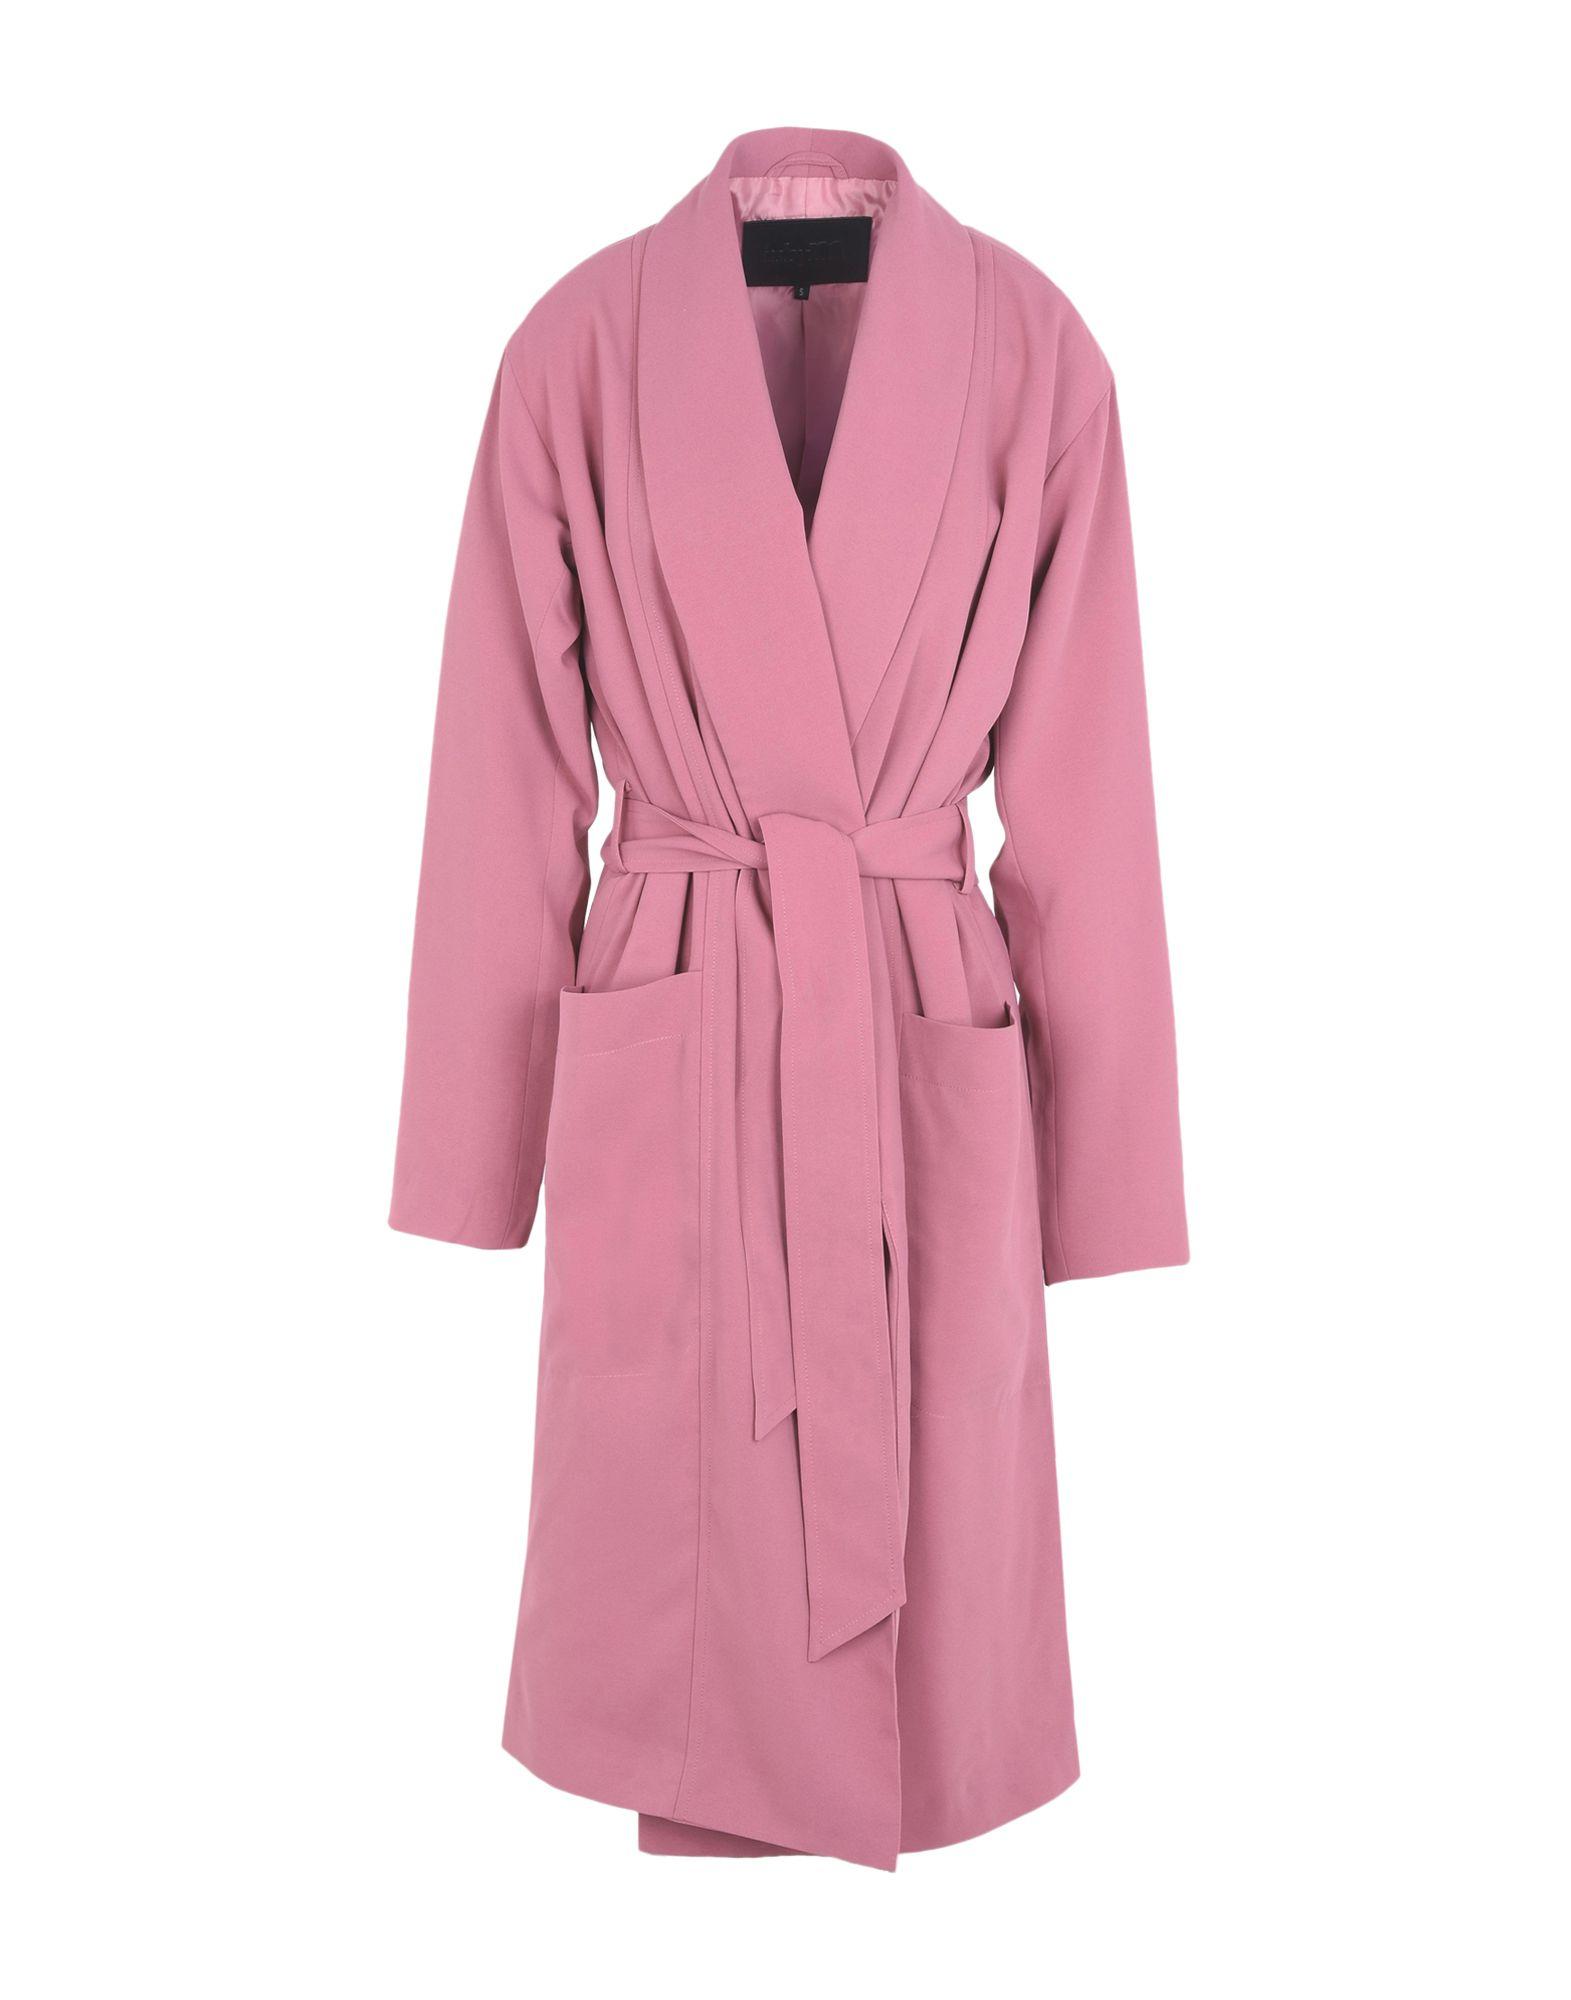 MBYM Coat in Pastel Pink